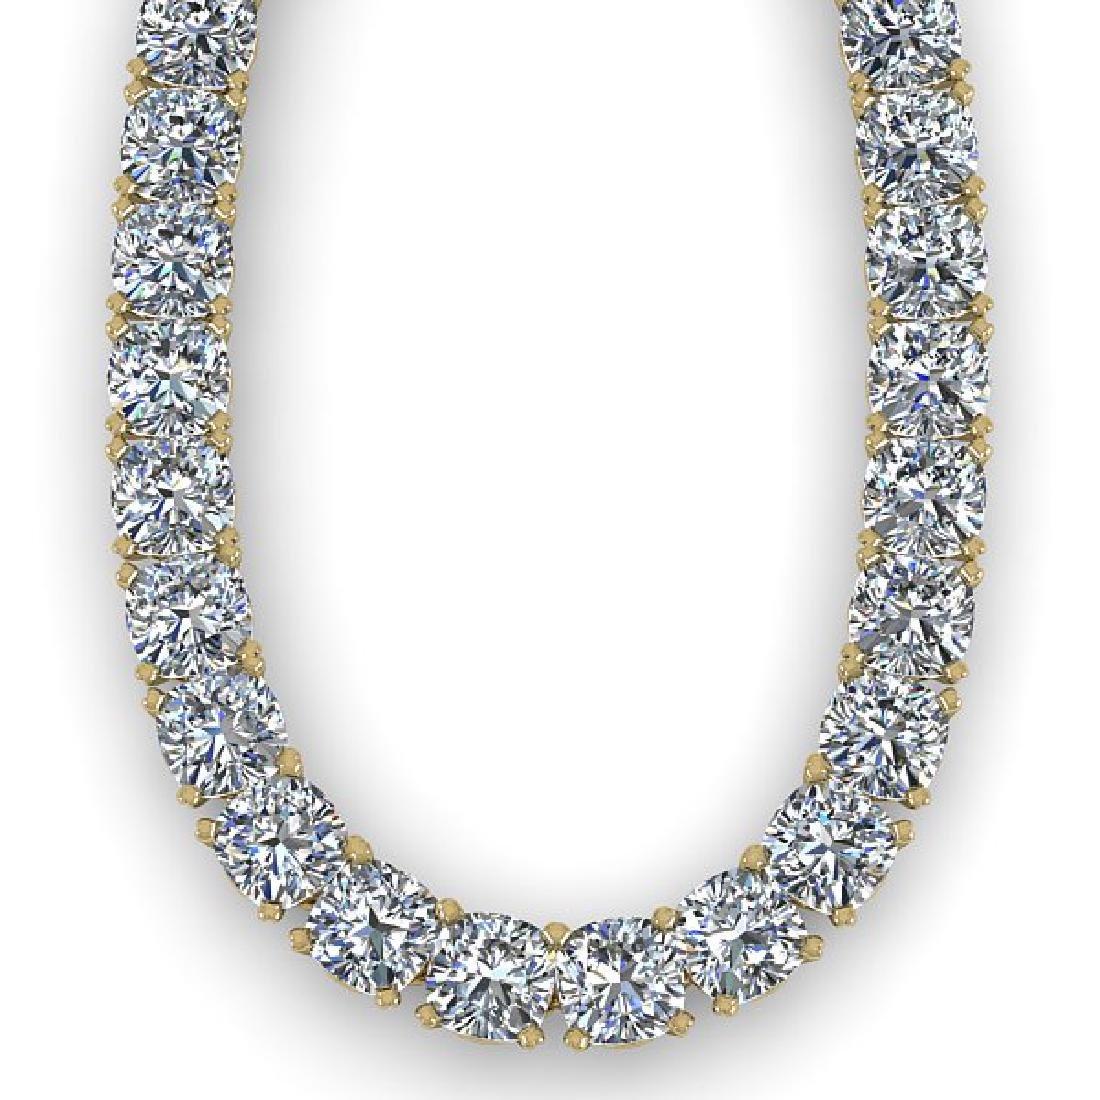 35 CTW Cushion Cut Certified SI Diamond Necklace 18K - 2